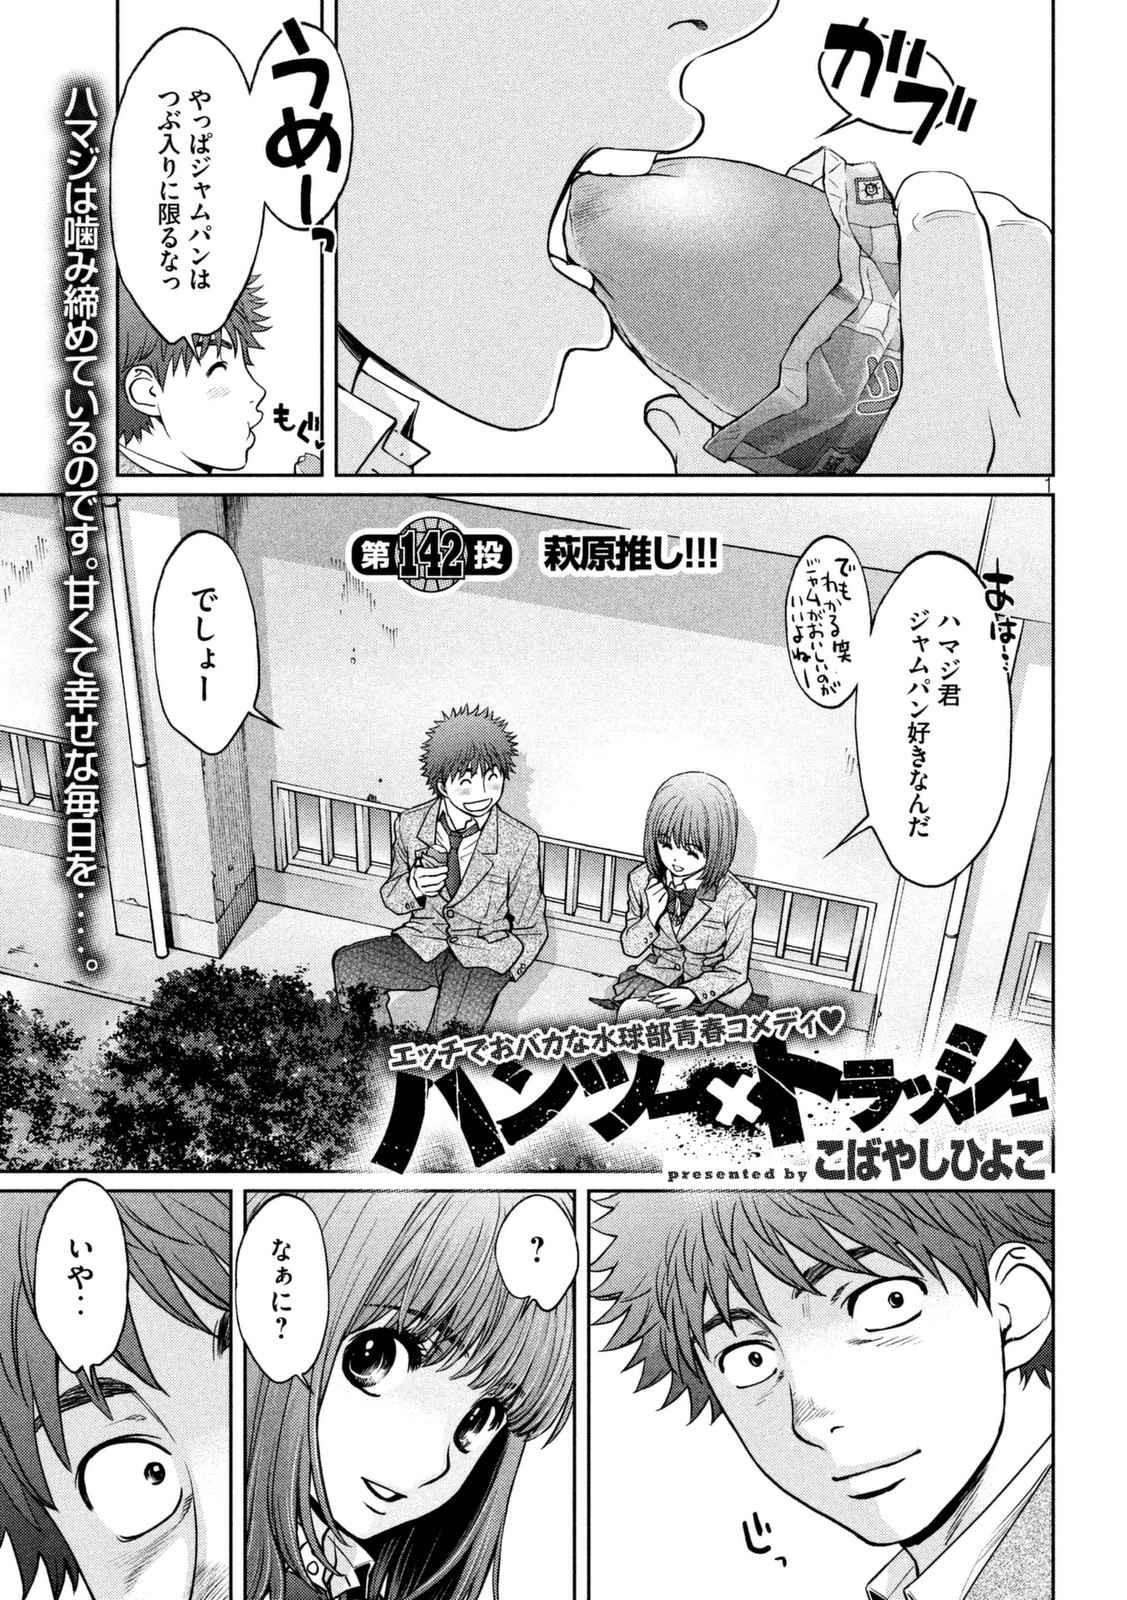 Hantsu_x_Trash Chapter 142 Page 1